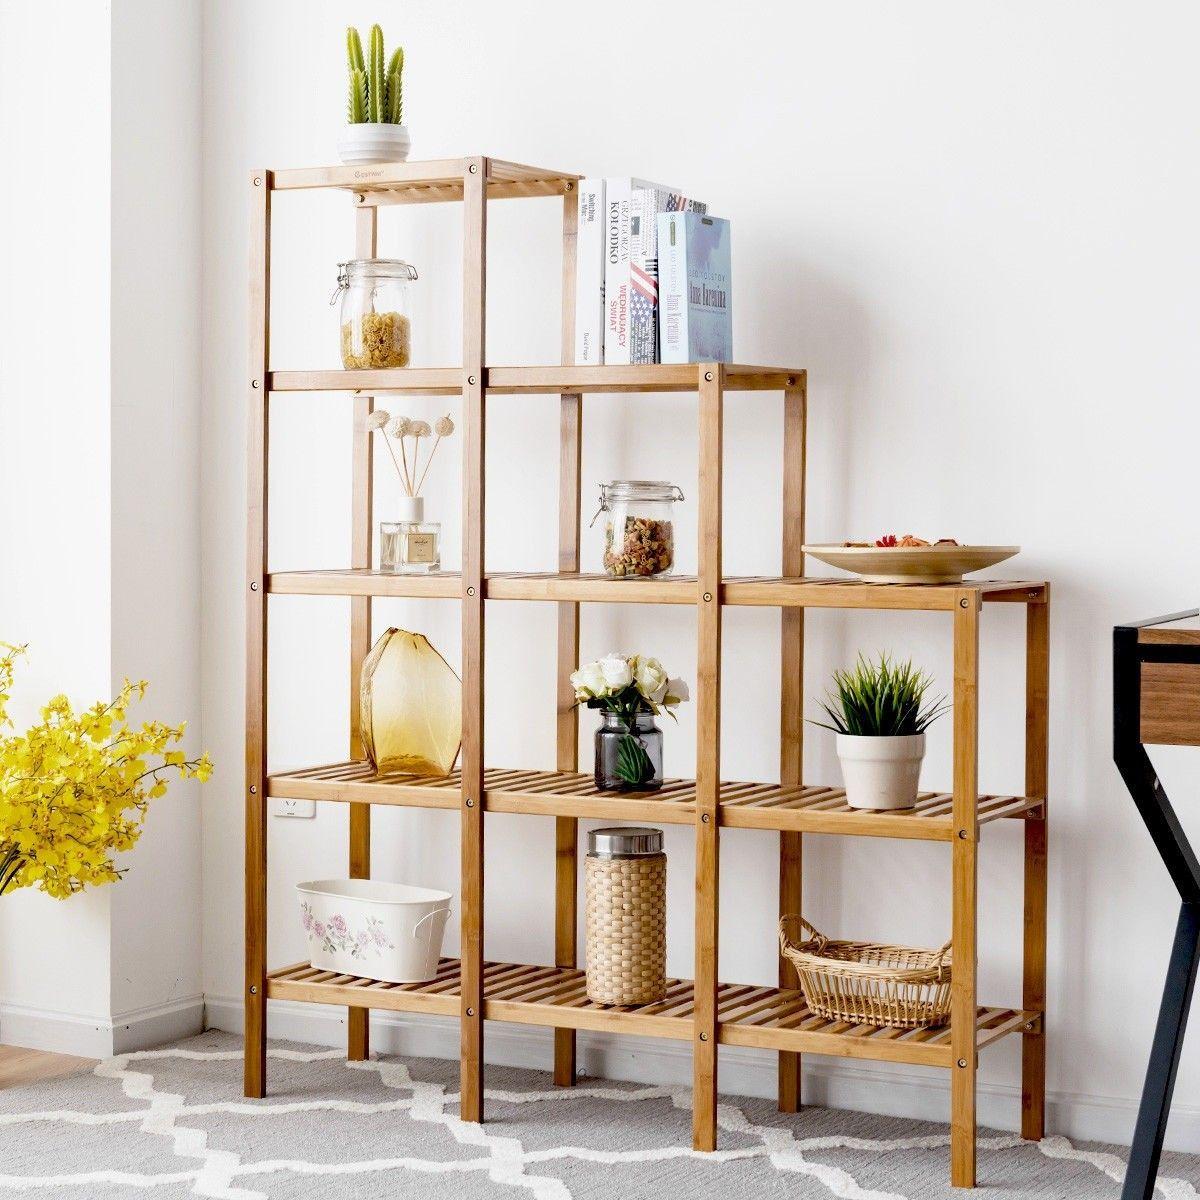 12 X 18 Living Room Ideas: Multifunctional Bamboo Shelf Display Organizer Color